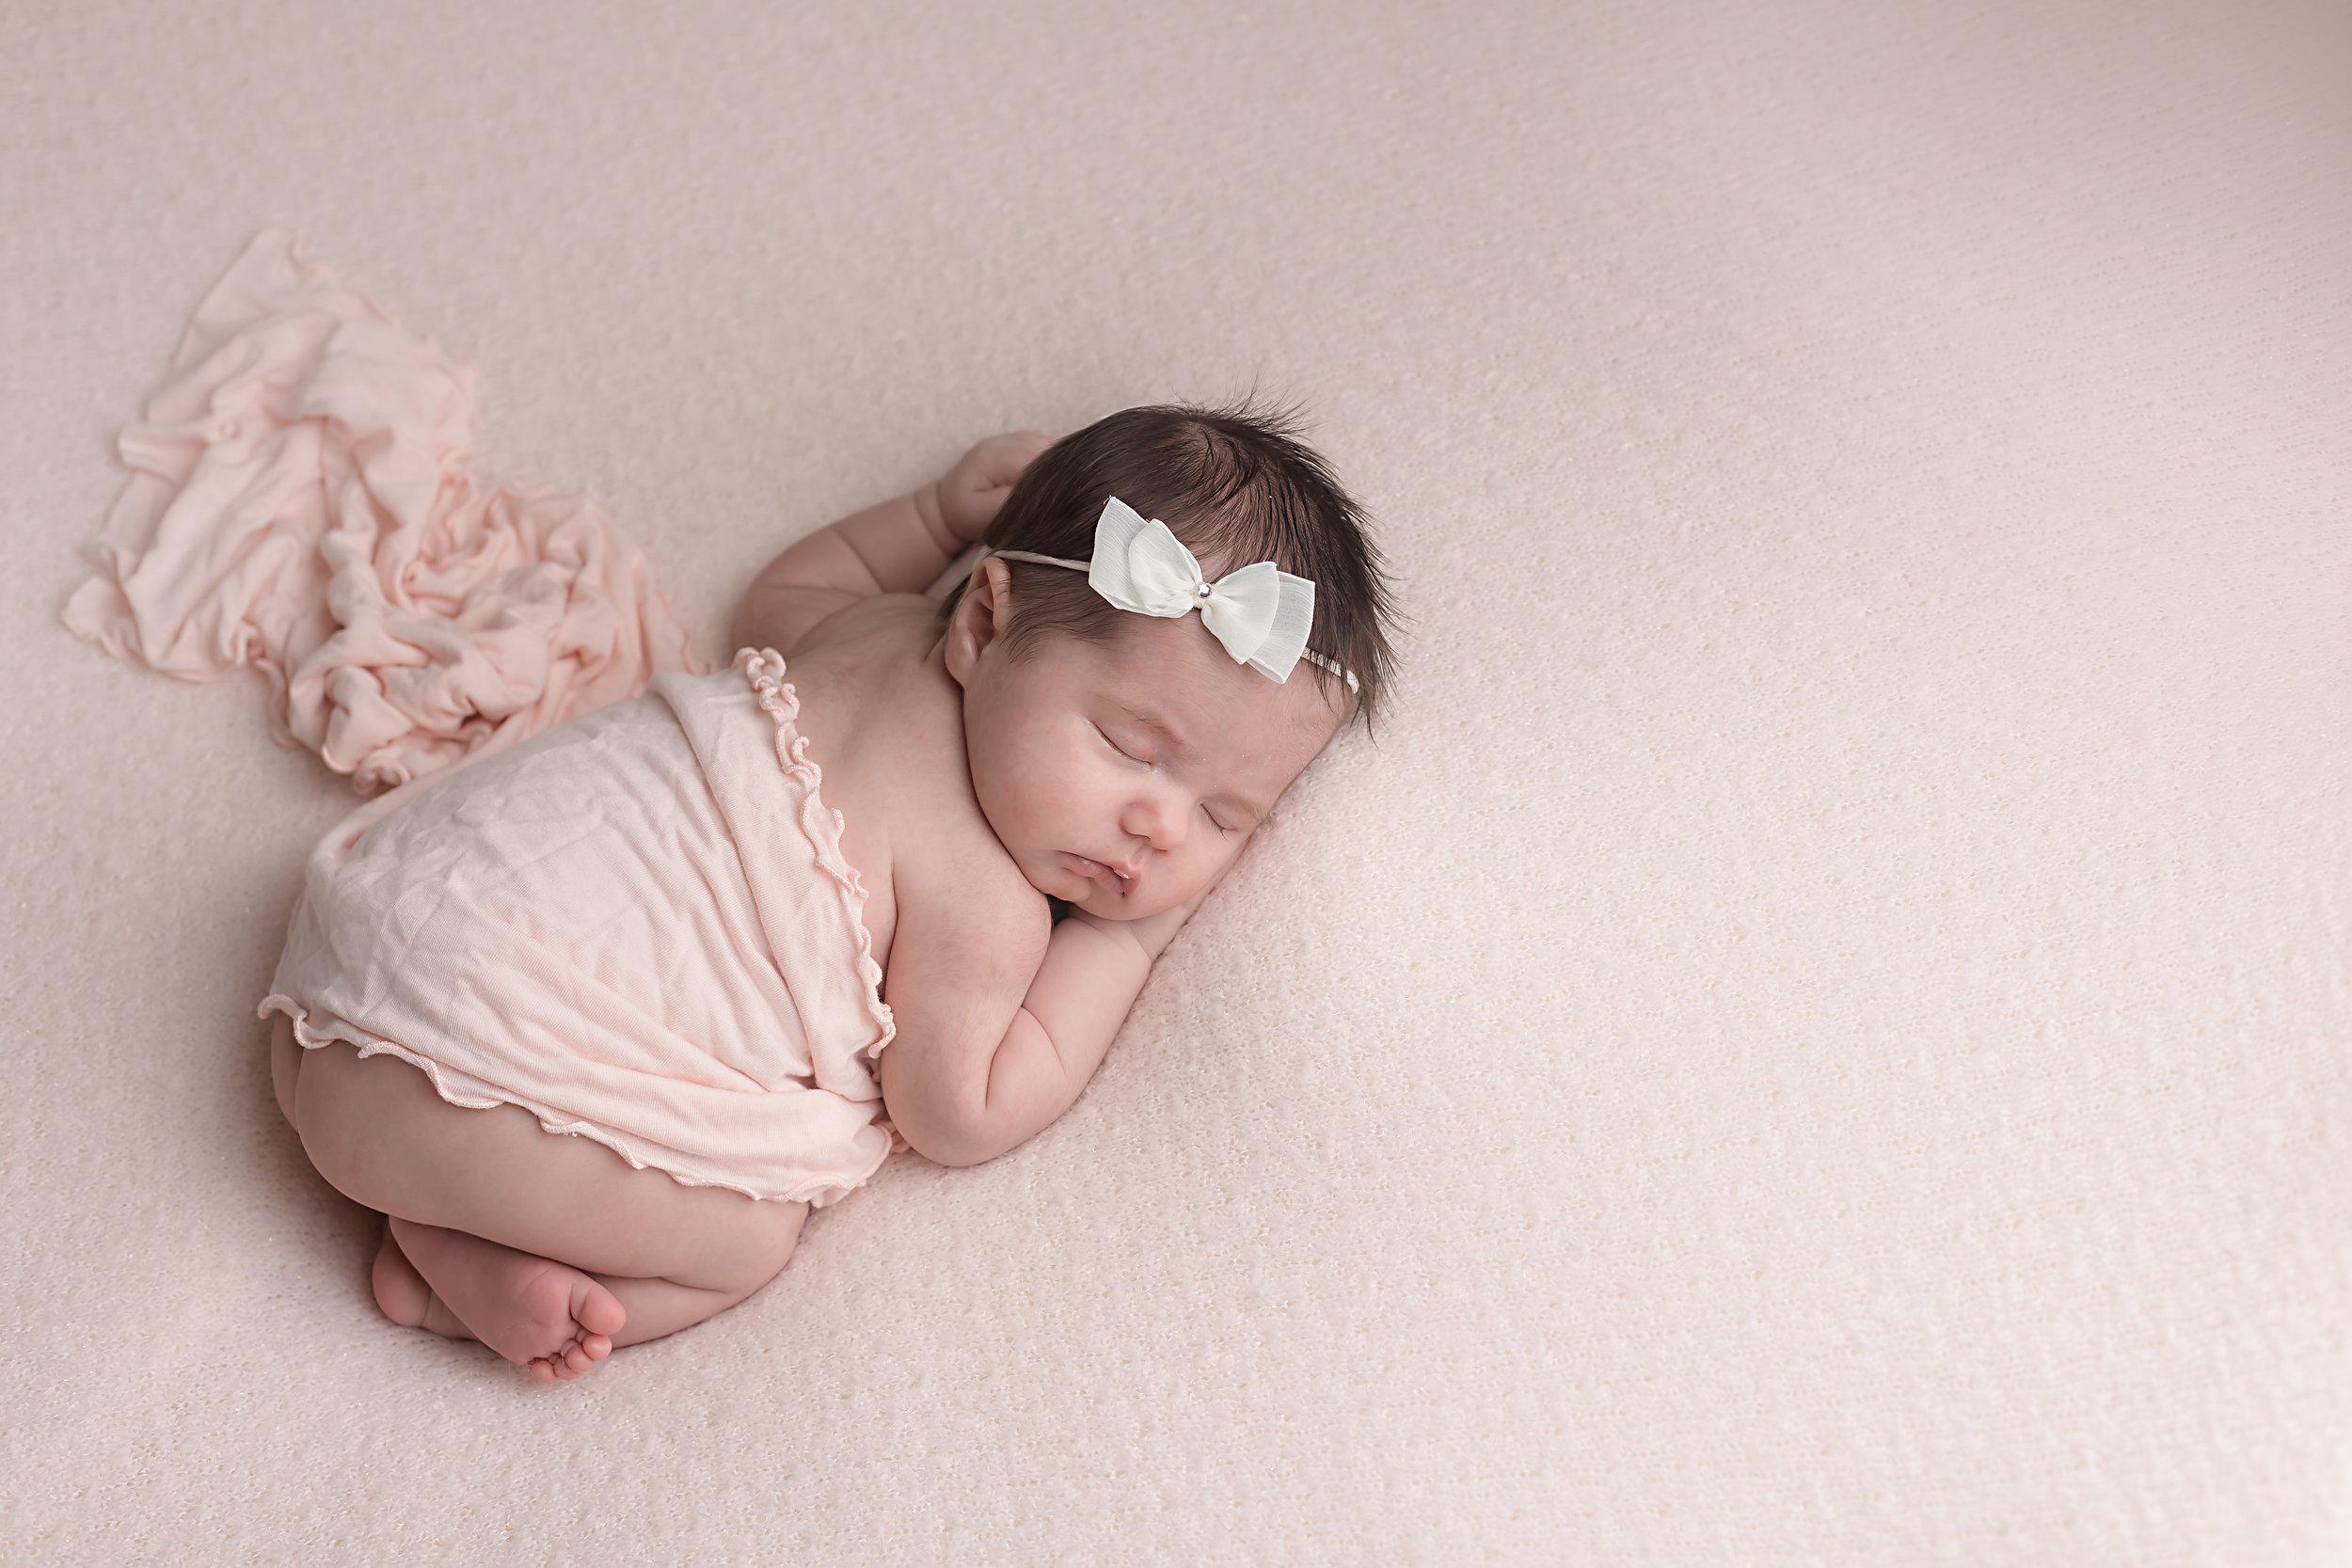 Danirosephotography.newbornphotographeraberdeen.babyphotography.2.jpg